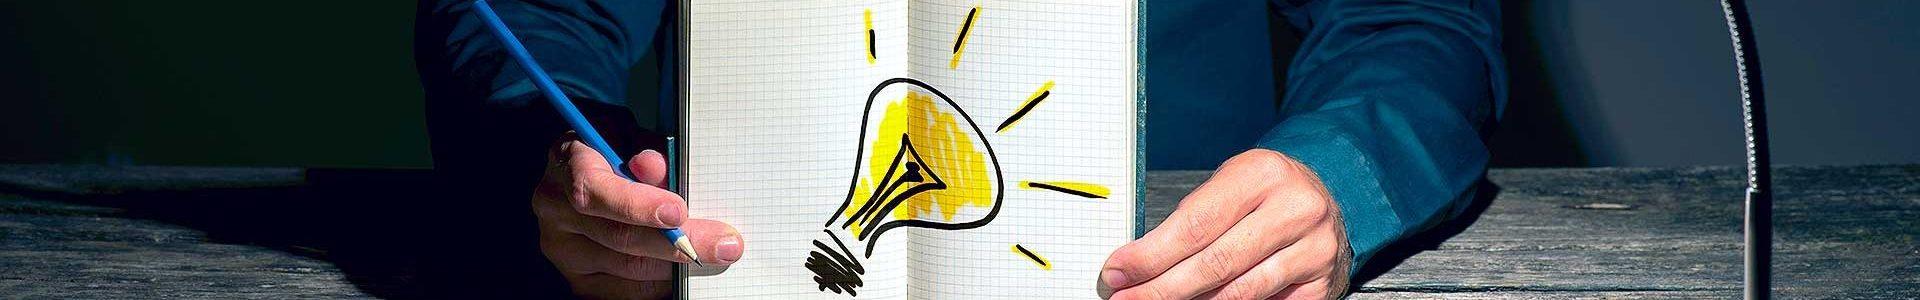 Lønfeldt Marketing idéer og tips til din markedsføring